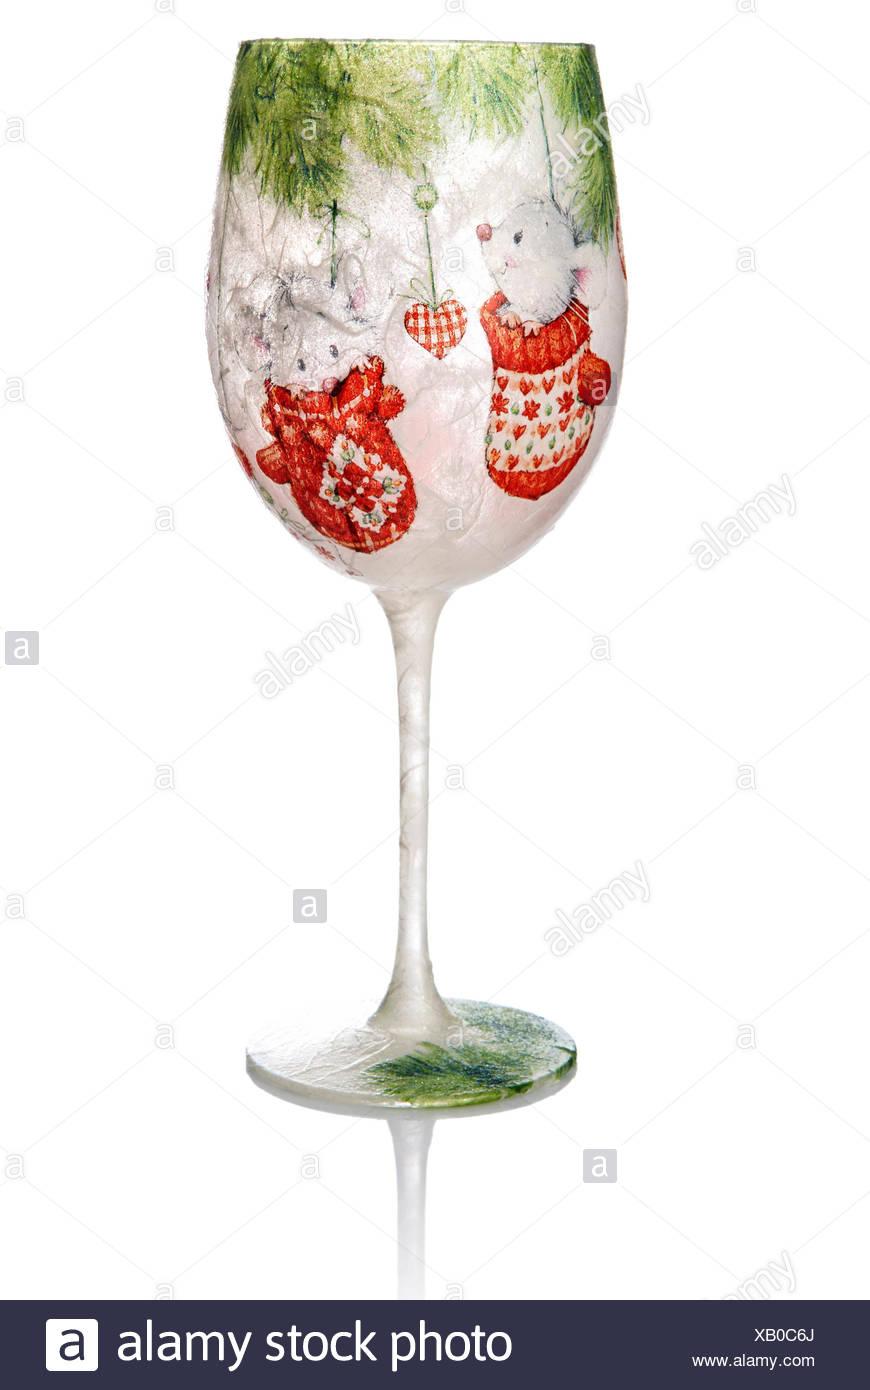 Christmas Decoupage On The Wine Glass Christmas Decoration